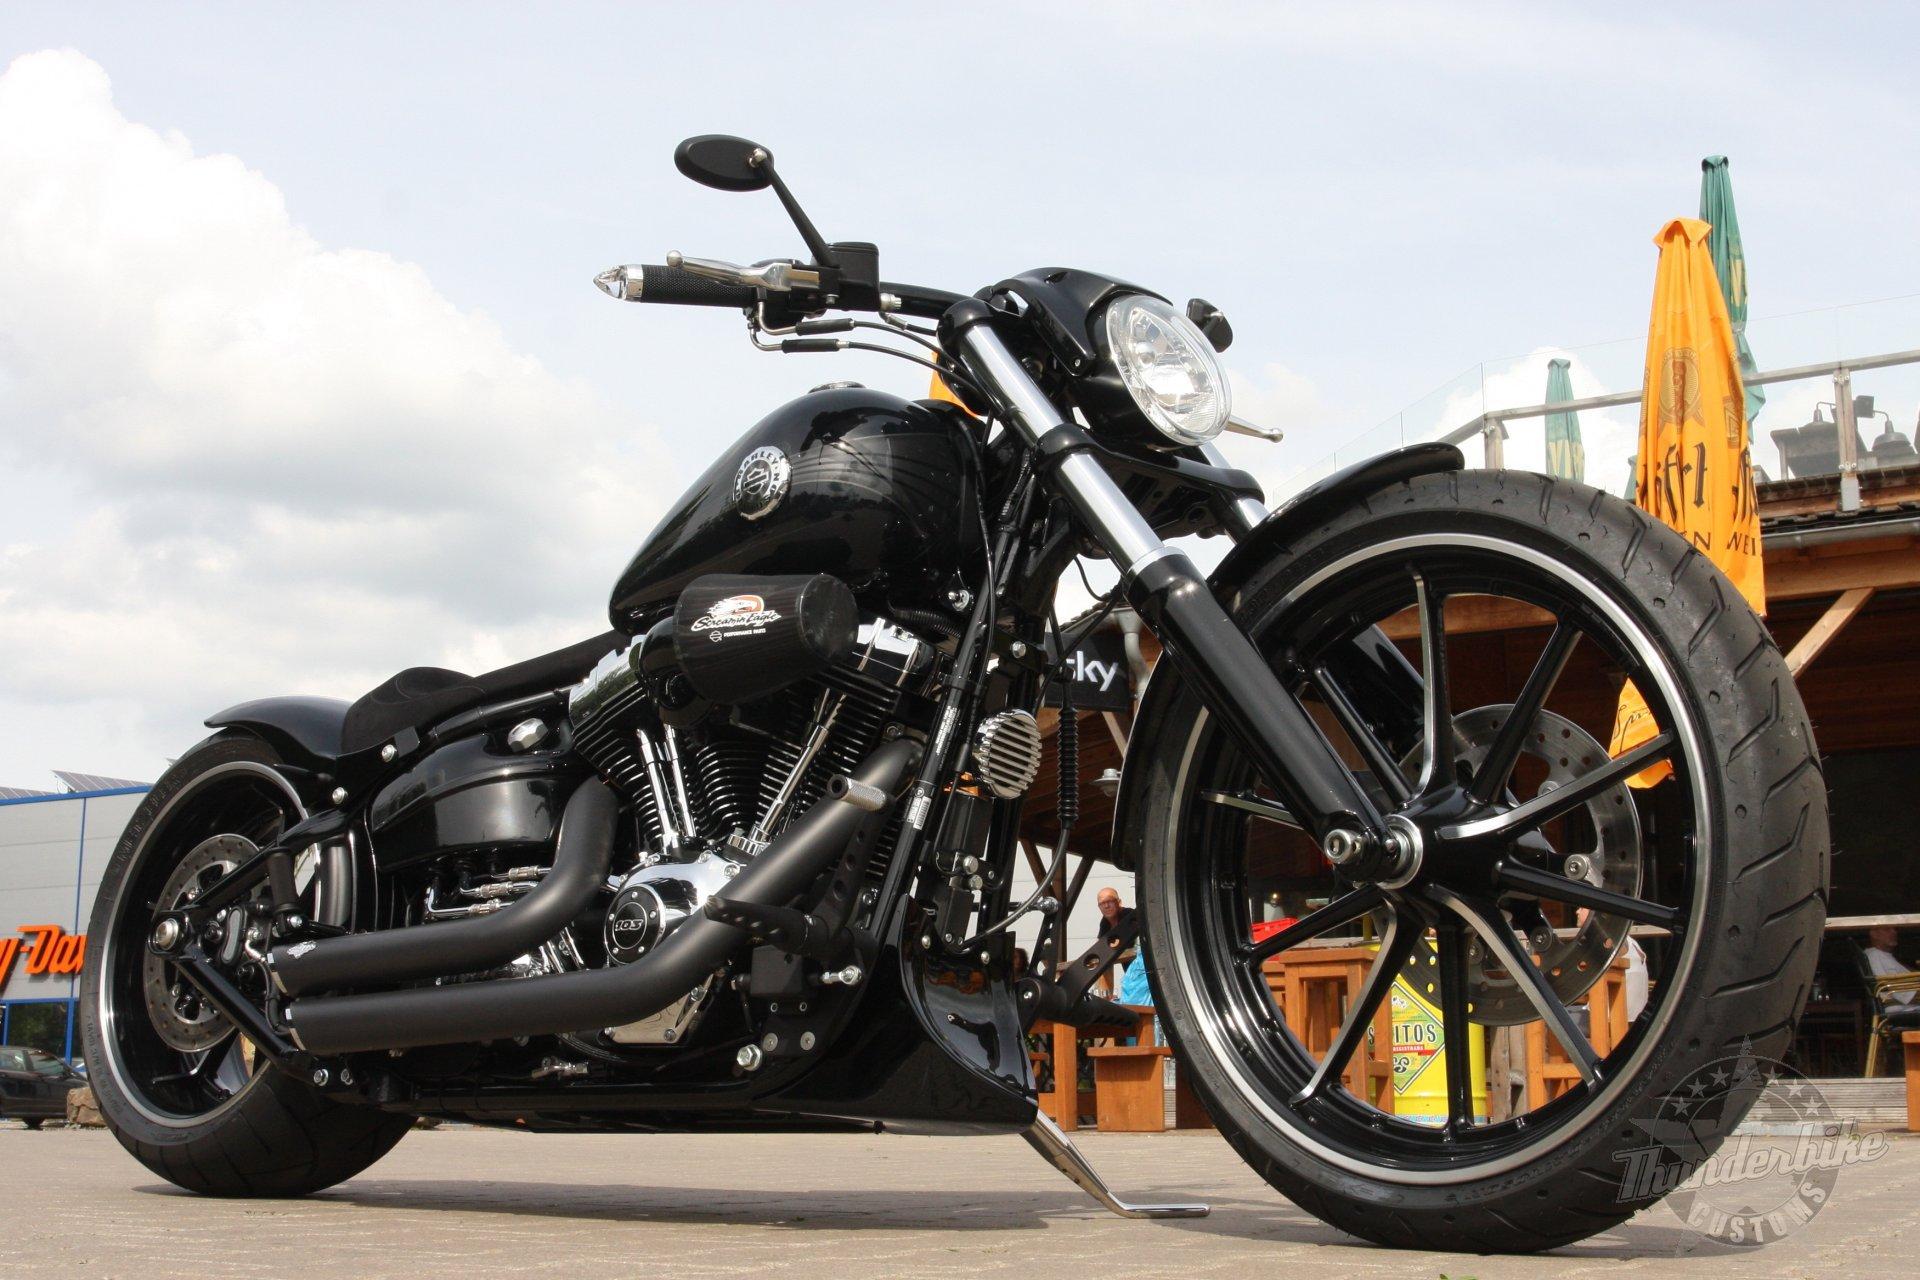 Фото мотоцикла харлей дэвидсон